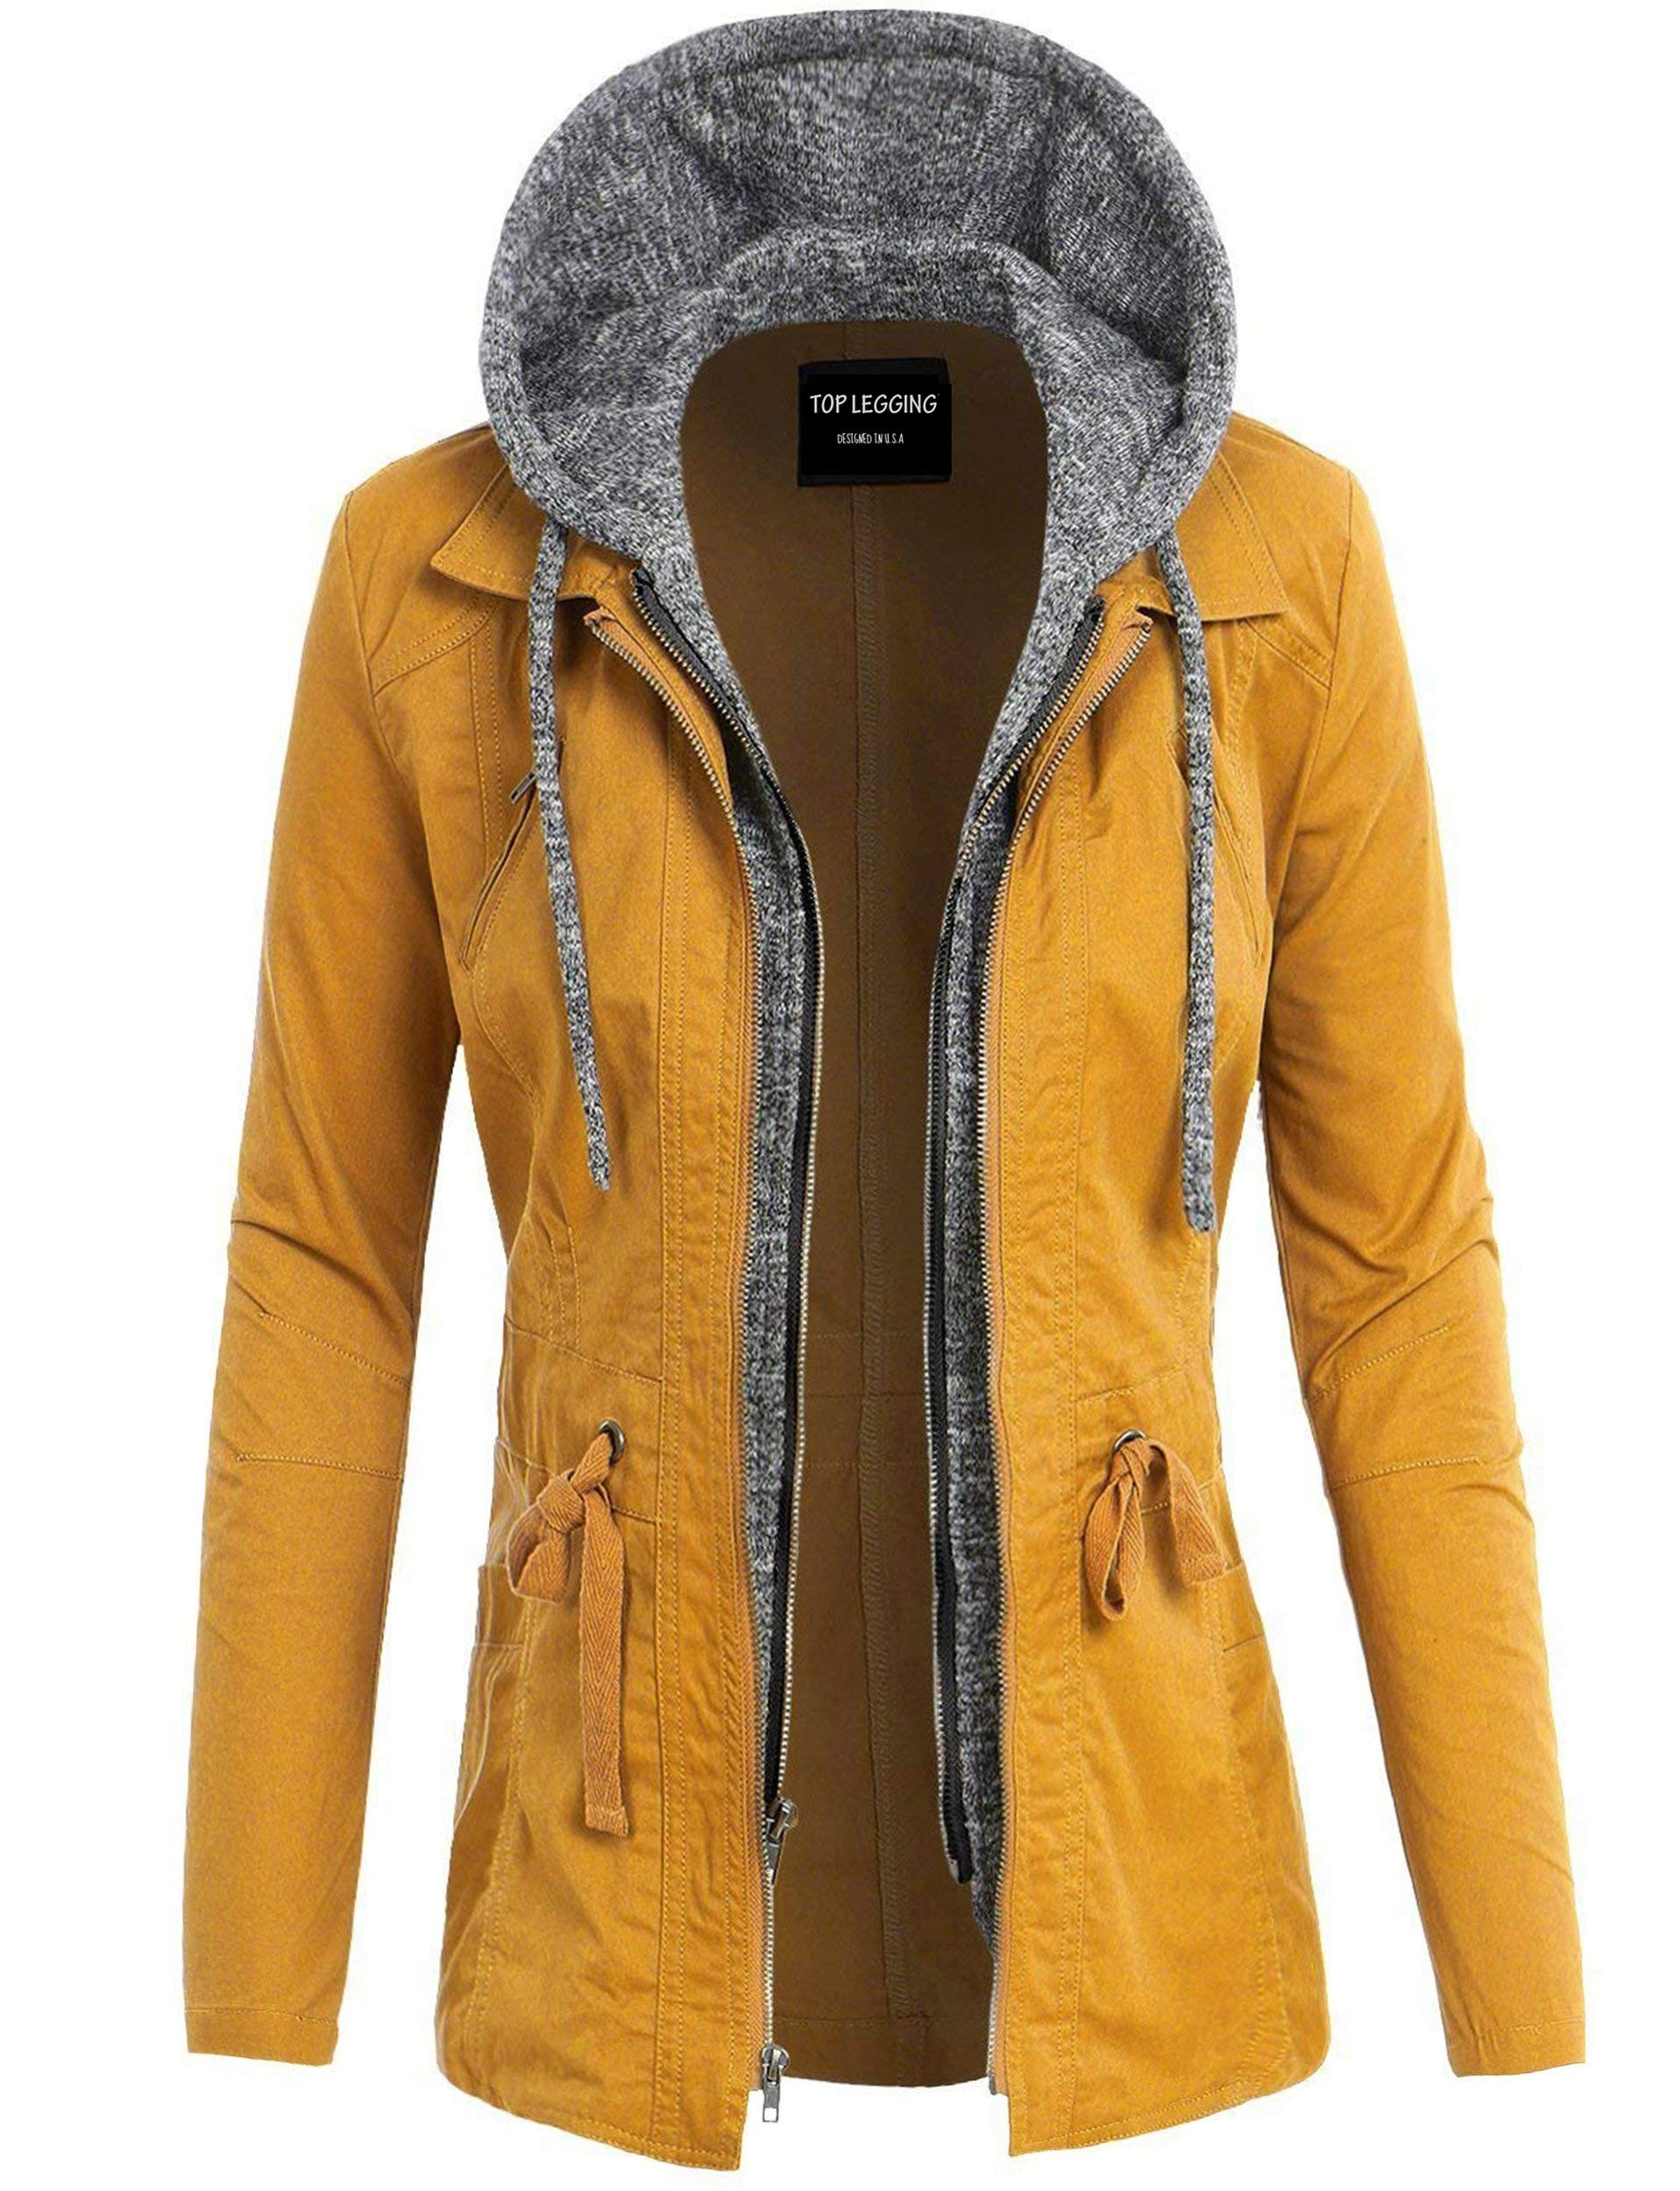 TOP LEGGING TL Women's Versatile Militray Anorak Parka Hoodie Jackets with Drawstring L22_ Mustard L